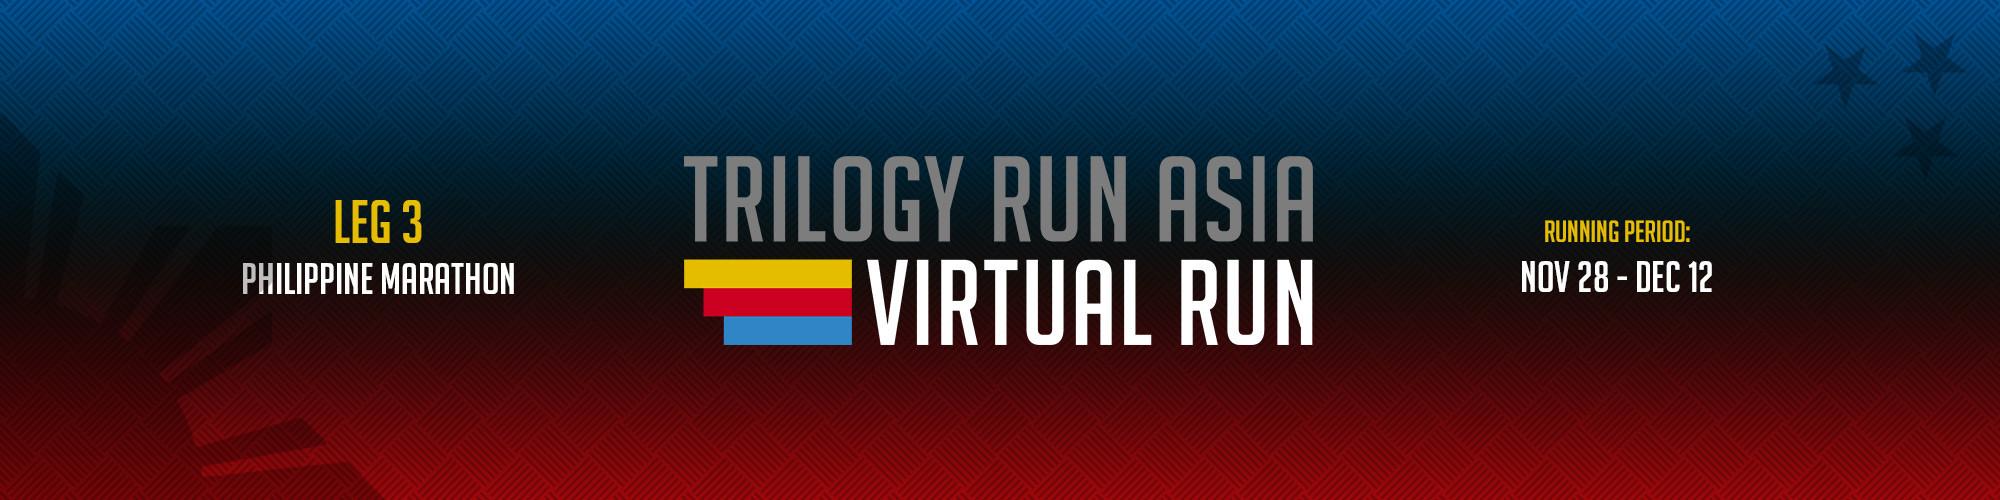 TRILOGY RUN ASIA 2020 Leg 3 - VIRTUAL RUN